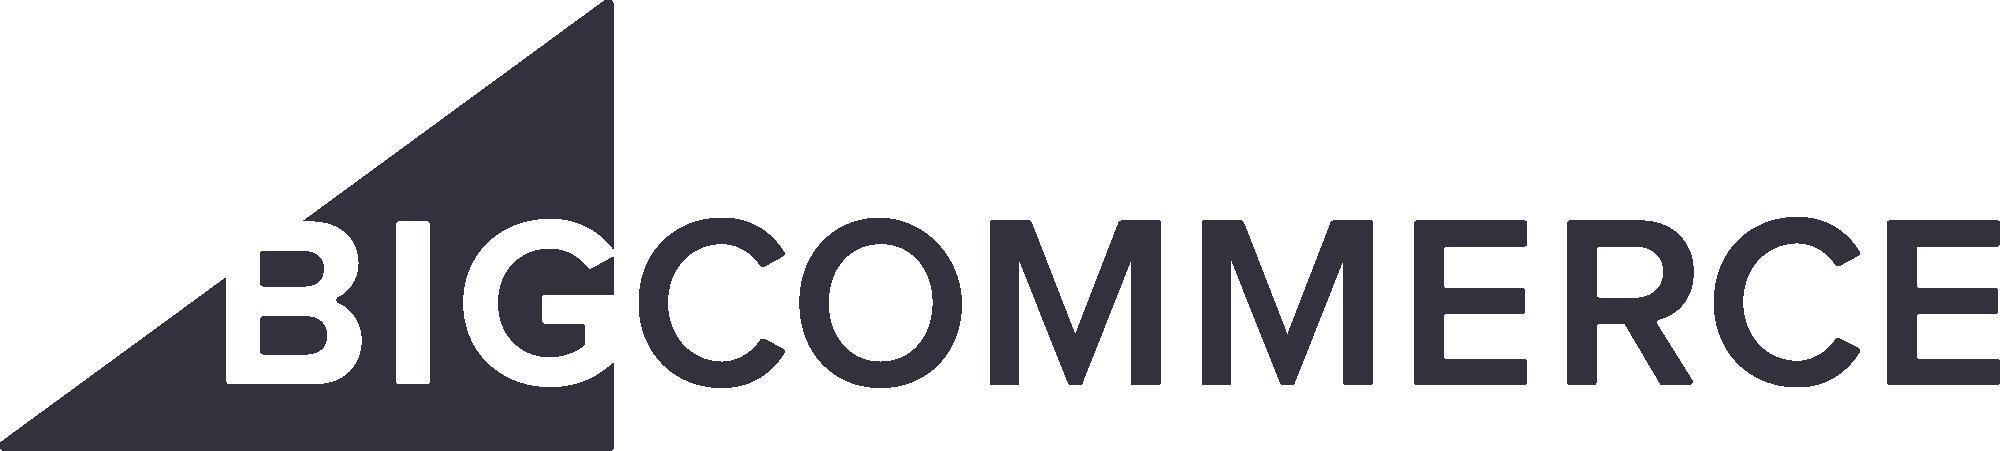 BigCommerce_logo_dark.png